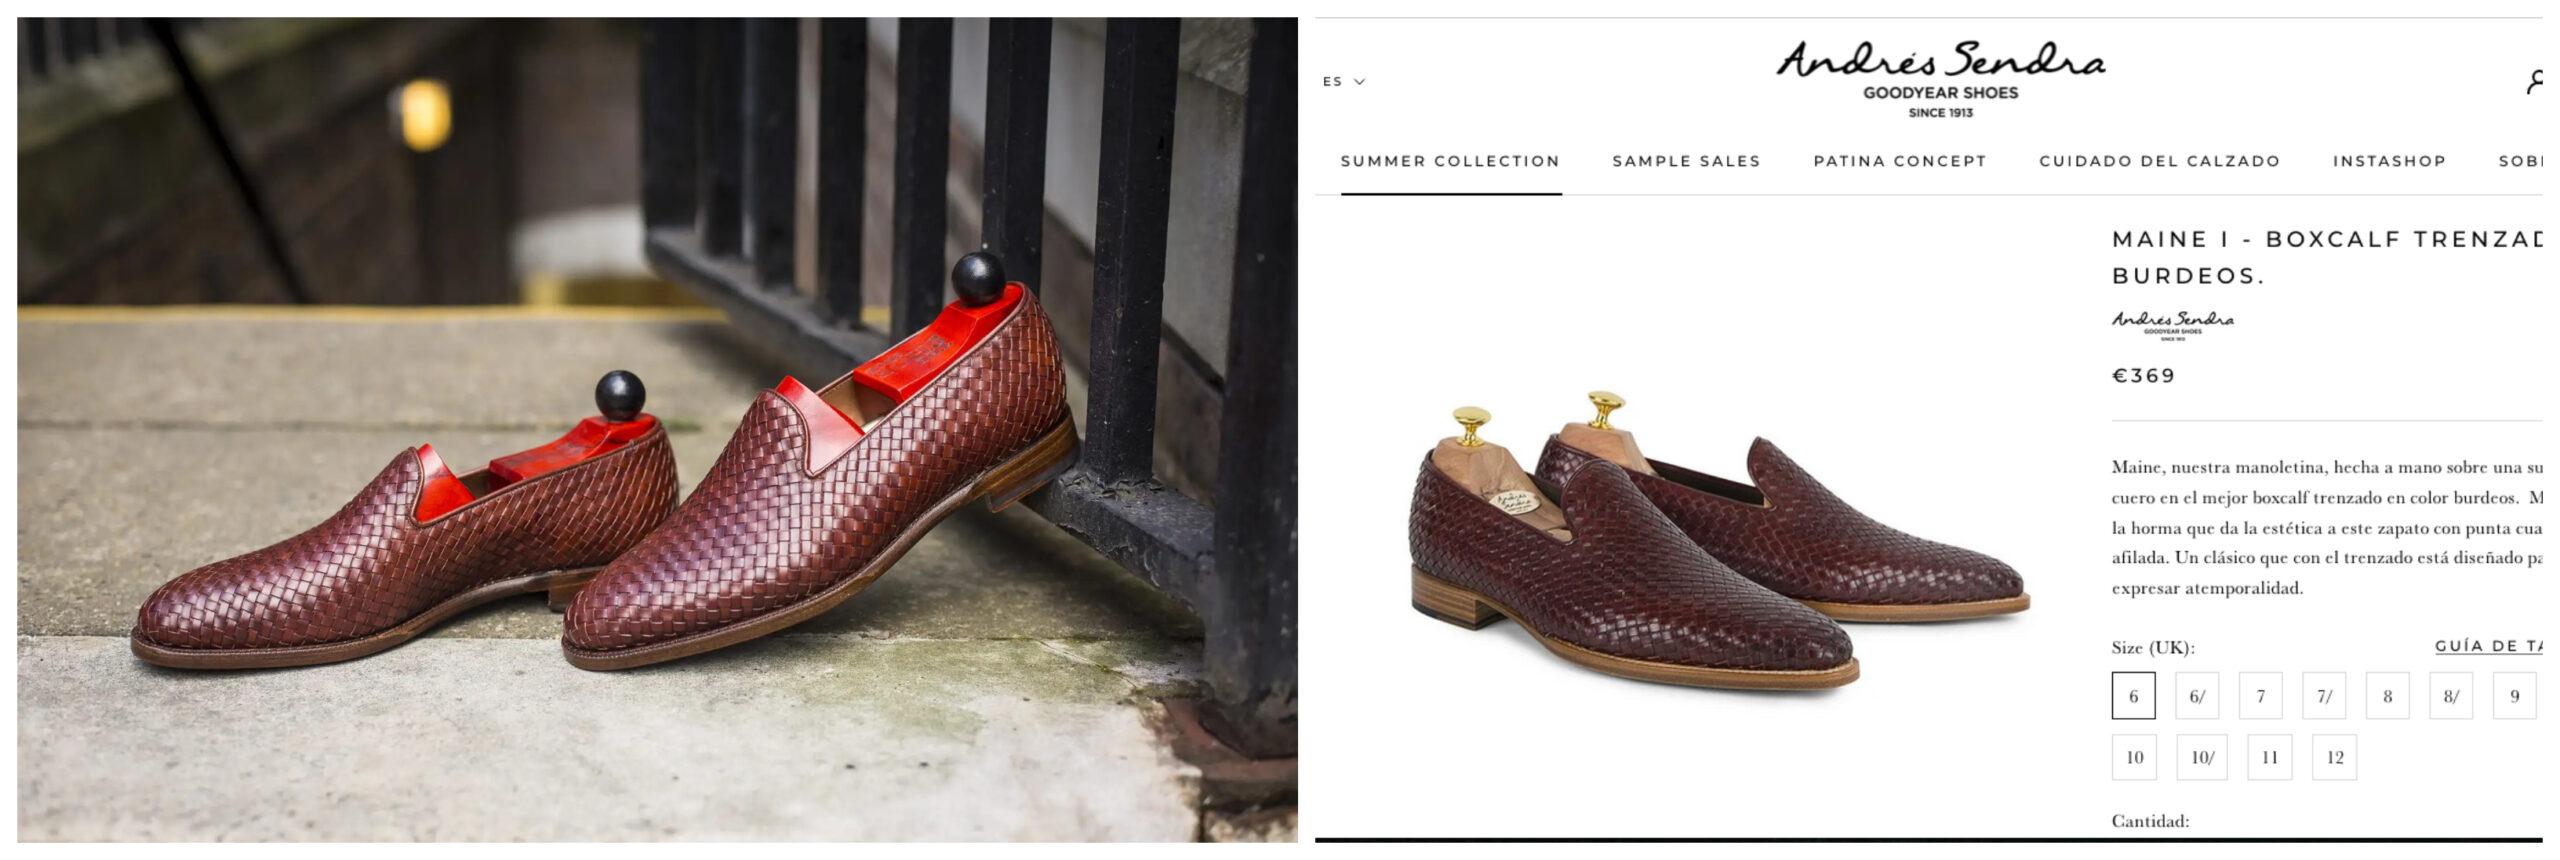 JFtizpatrick shoes Andres Sendra